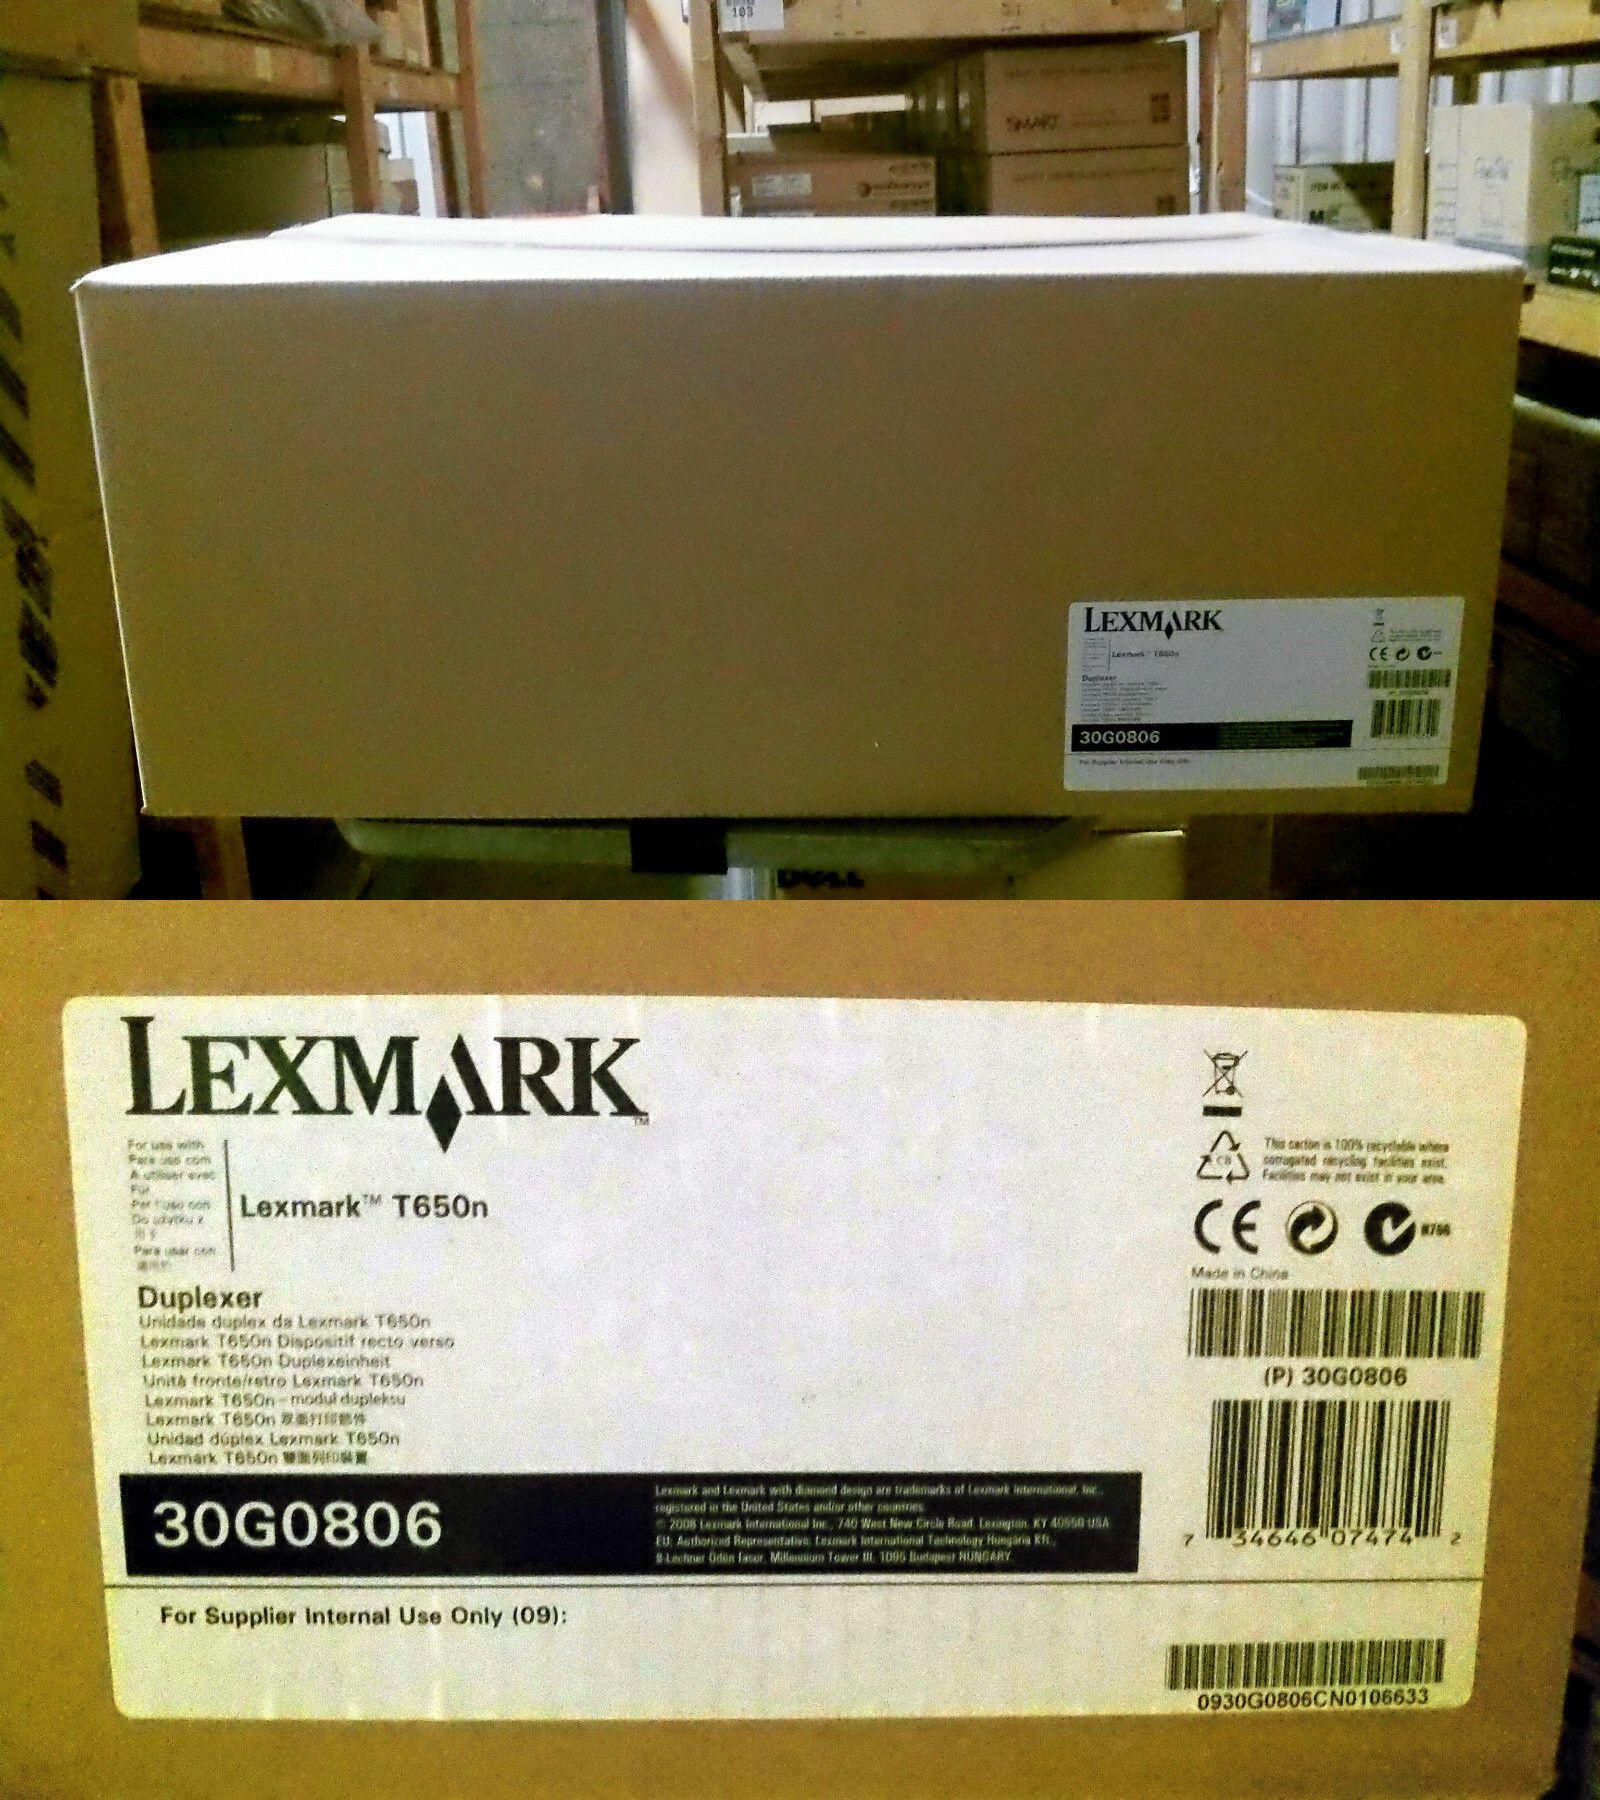 NEW Lexmark T650n Duplexer 30G0806